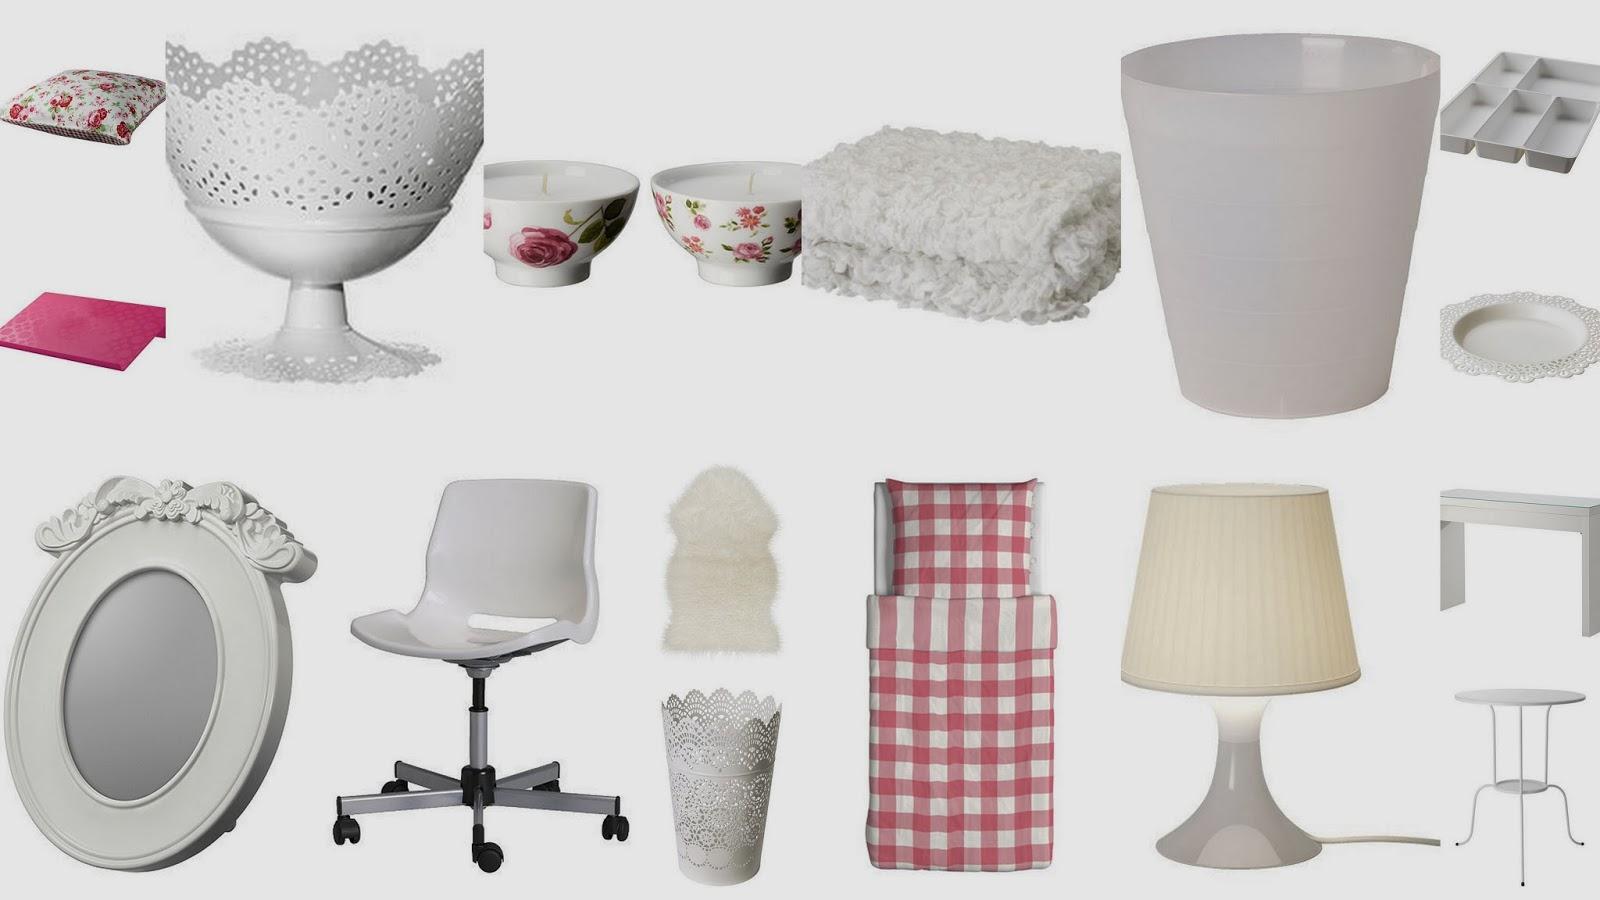 mein leben voller gedanken projekt neues zimmer. Black Bedroom Furniture Sets. Home Design Ideas